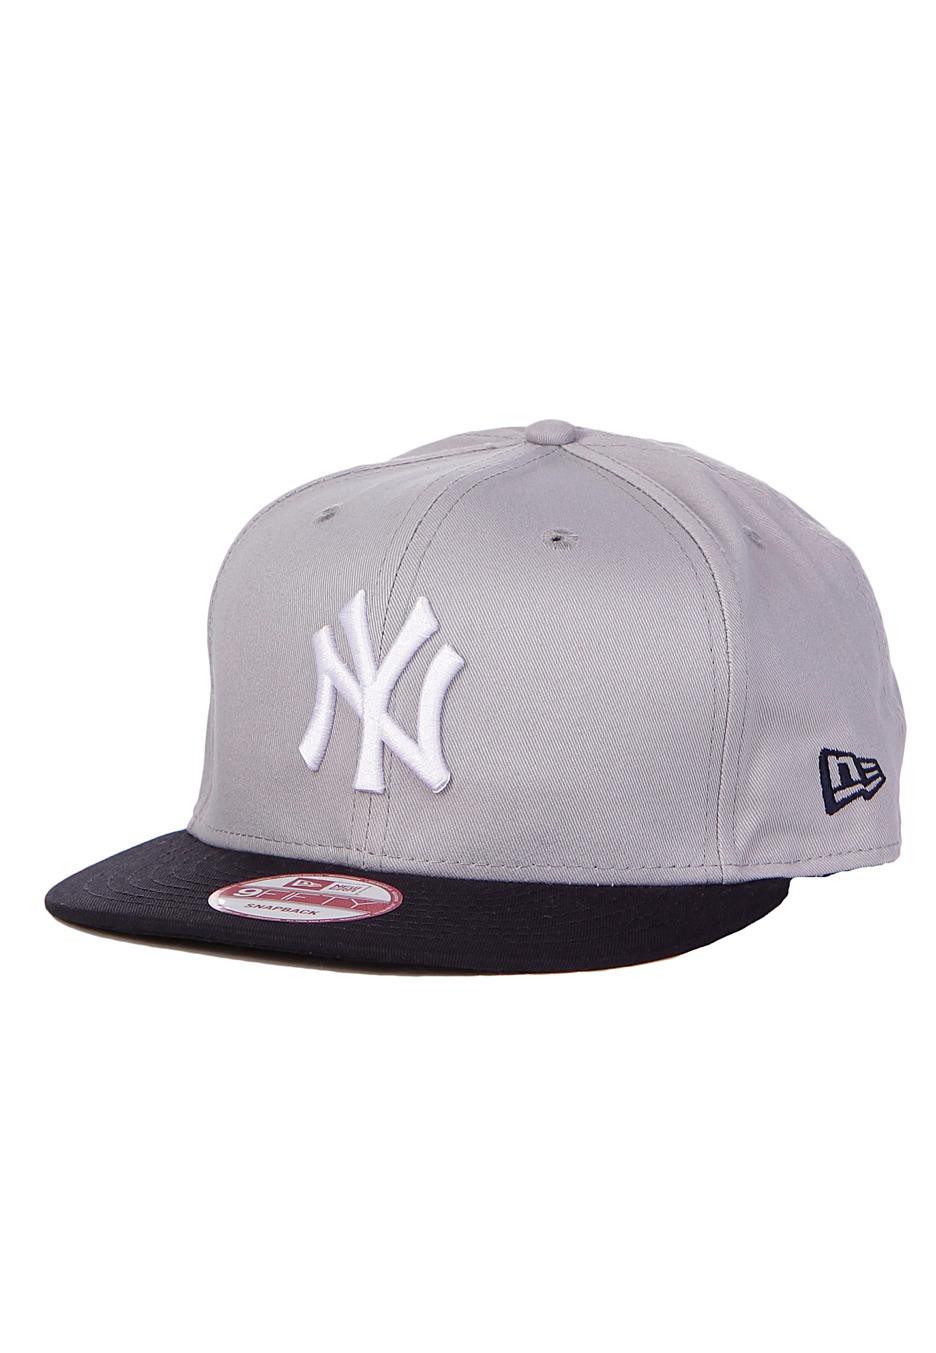 dc868a8b4d5 New Era - Cotton Block I New York Yankees Grey Team Snapback - Cap - Streetwear  Shop - Impericon.com AU